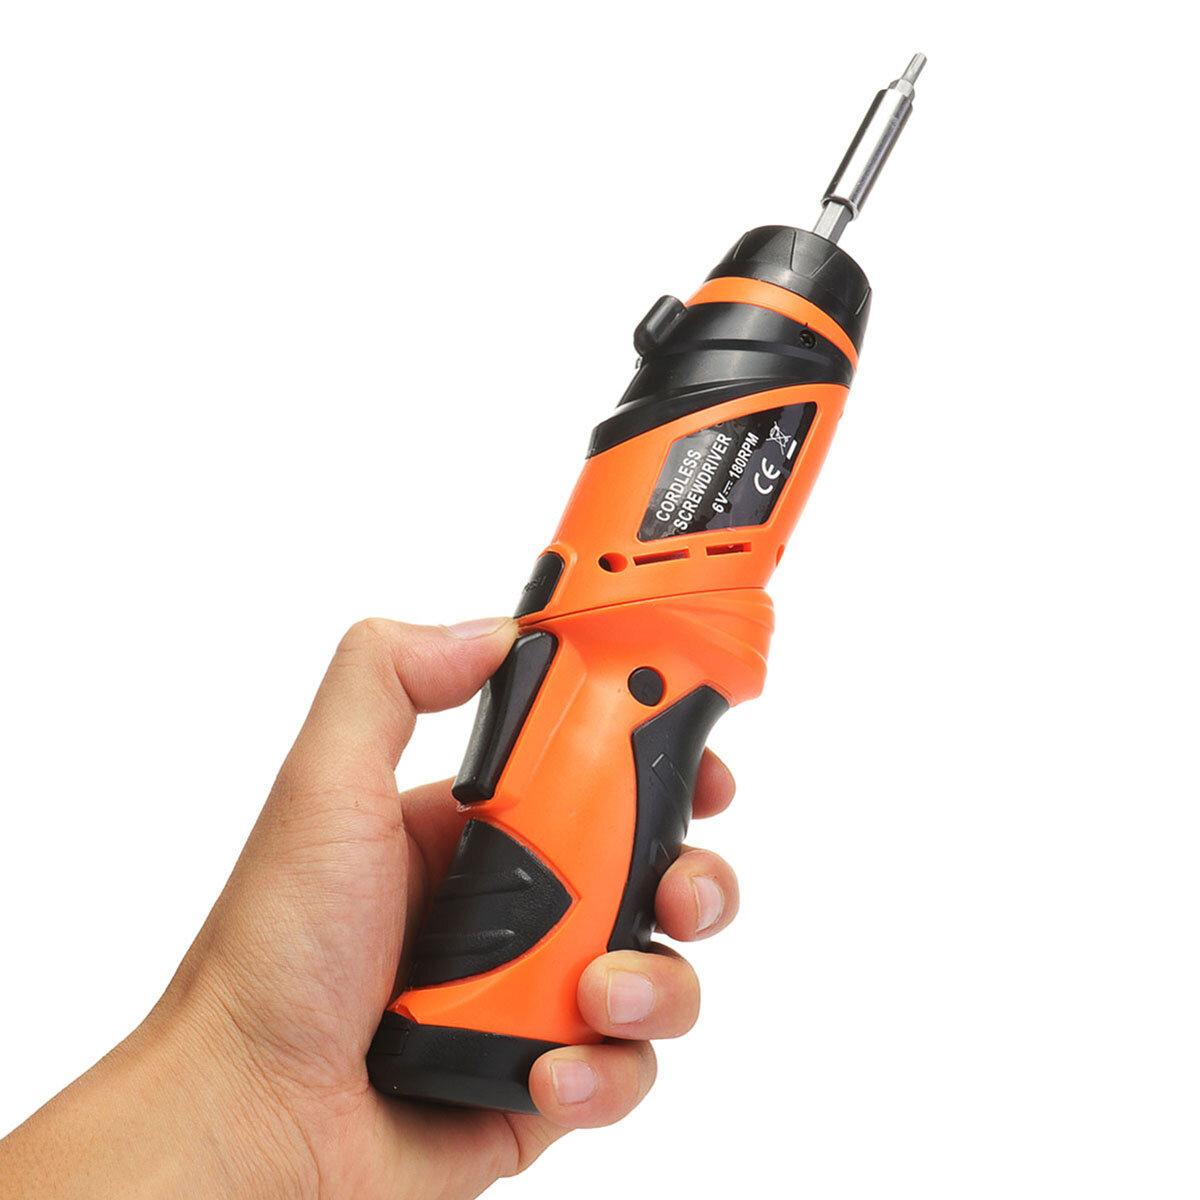 6V Lipat Listrik Obeng Power Drill Baterai Dioperasikan Cordless Screw Driver Tool